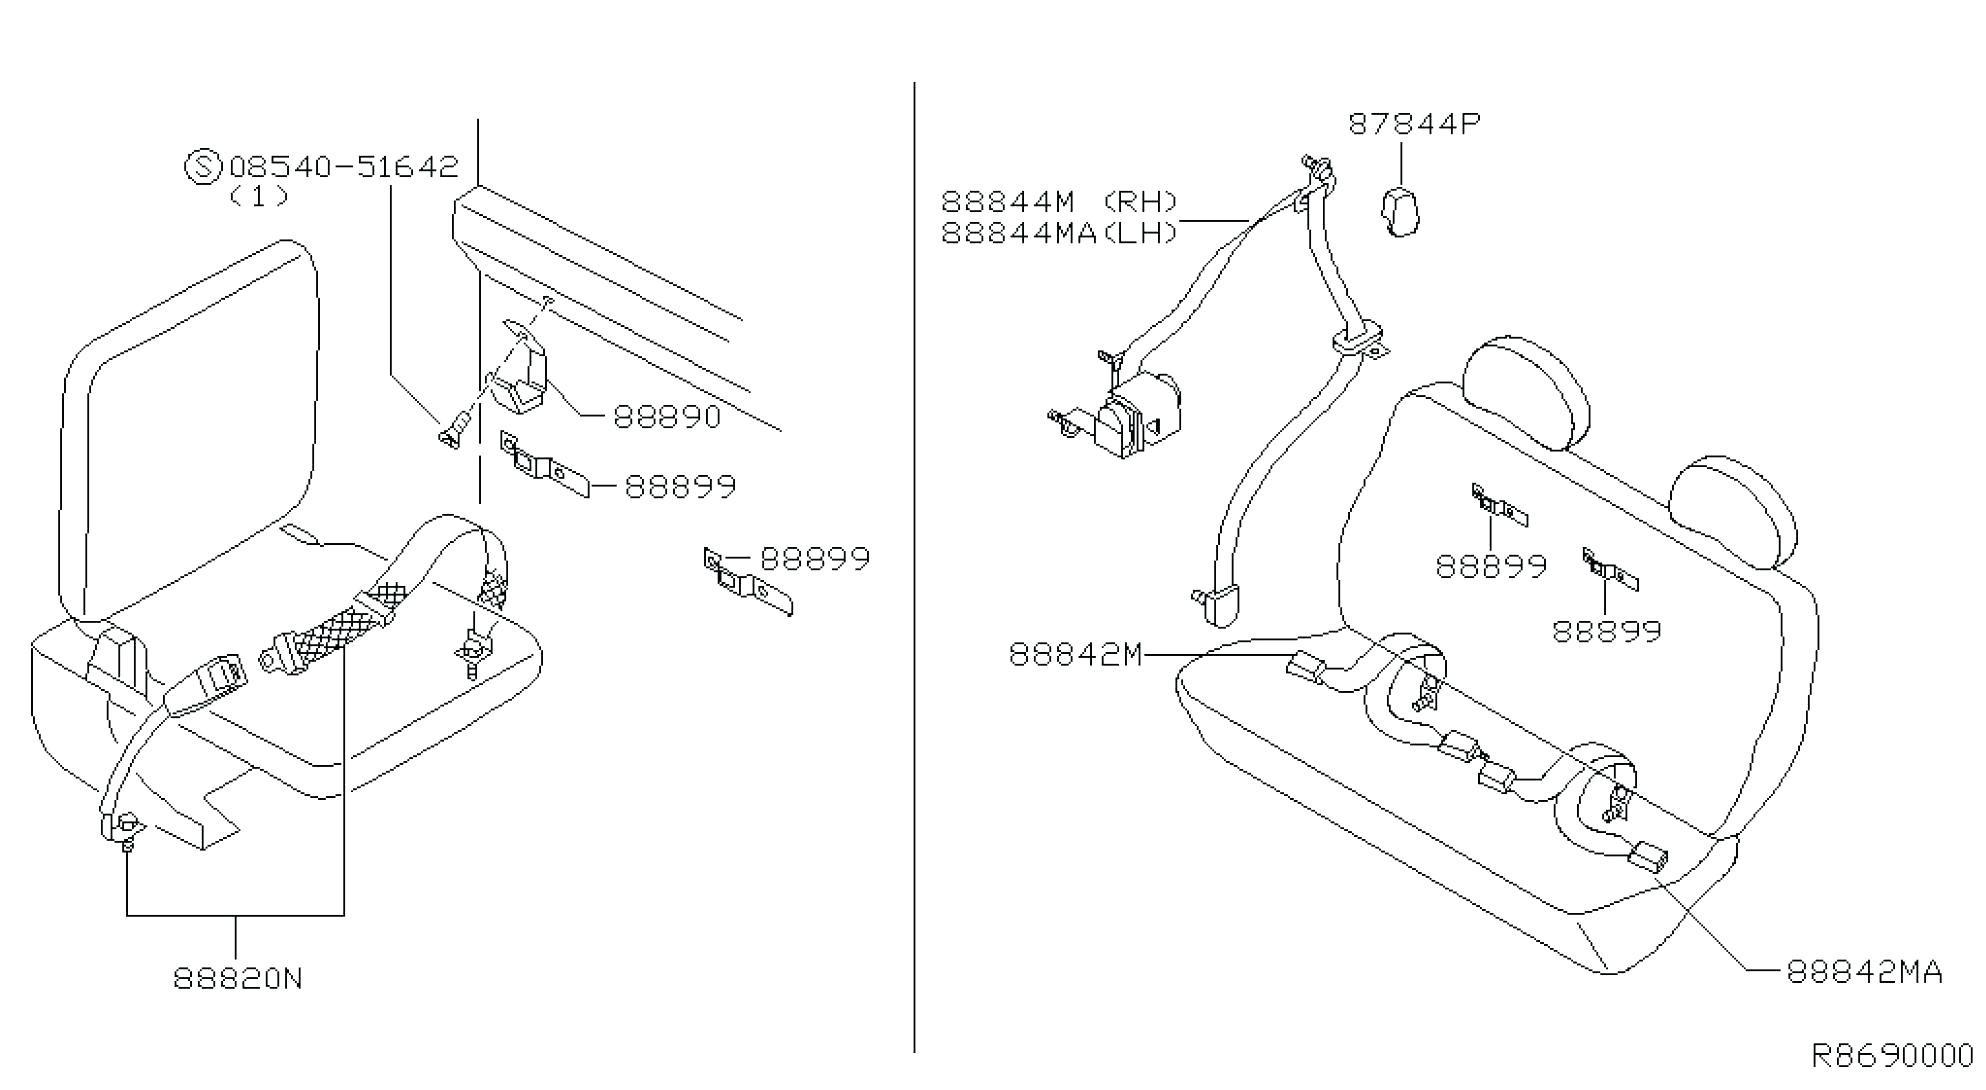 2001 Camry Engine Diagram 4 Cylinder Engine Diagram Inline